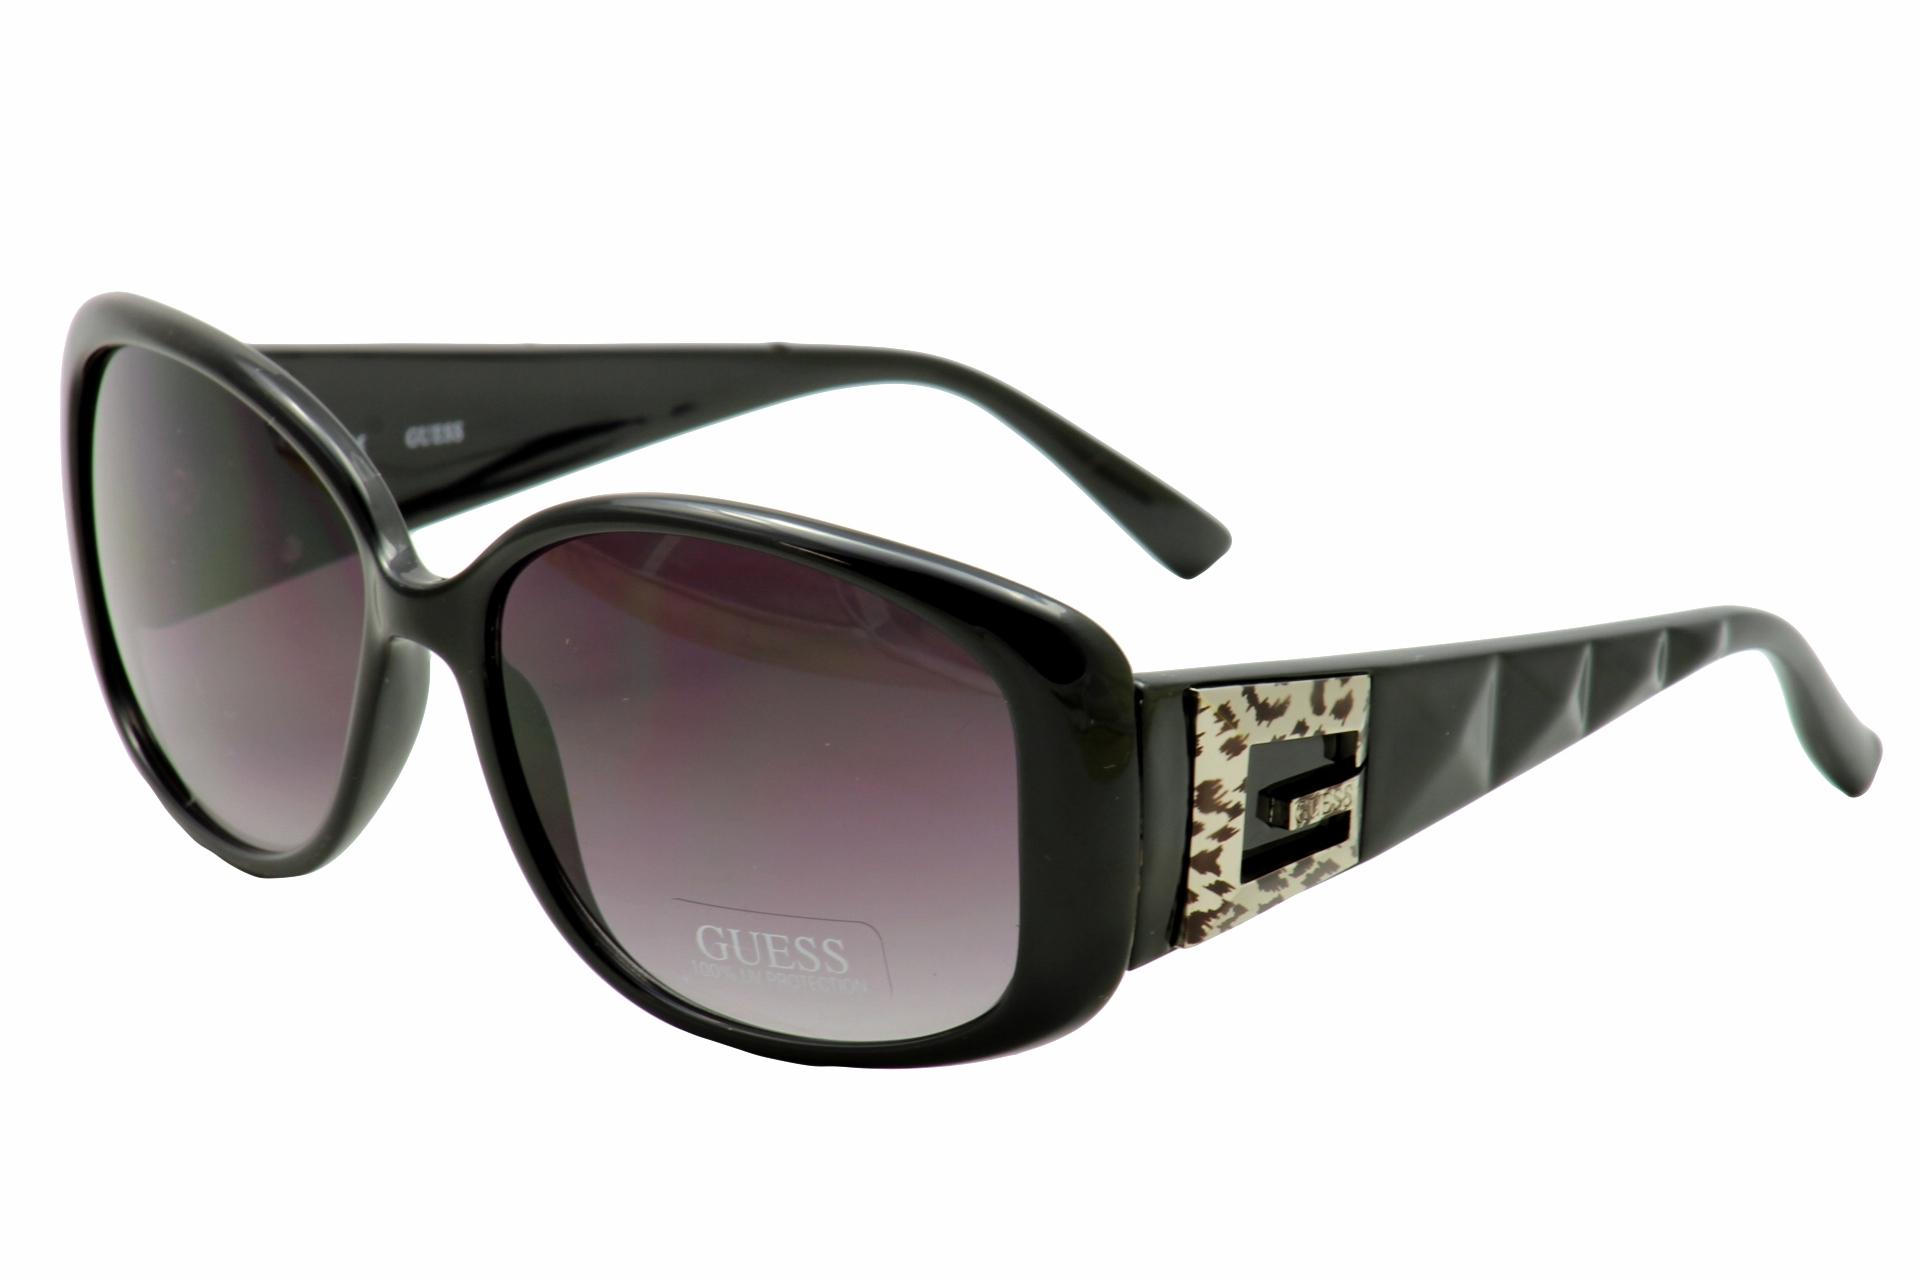 bdaa8a4a03c Guess Women s GU7141 GU 7141 BLK-35 Black Rectangle Sunglasses 56mm ...